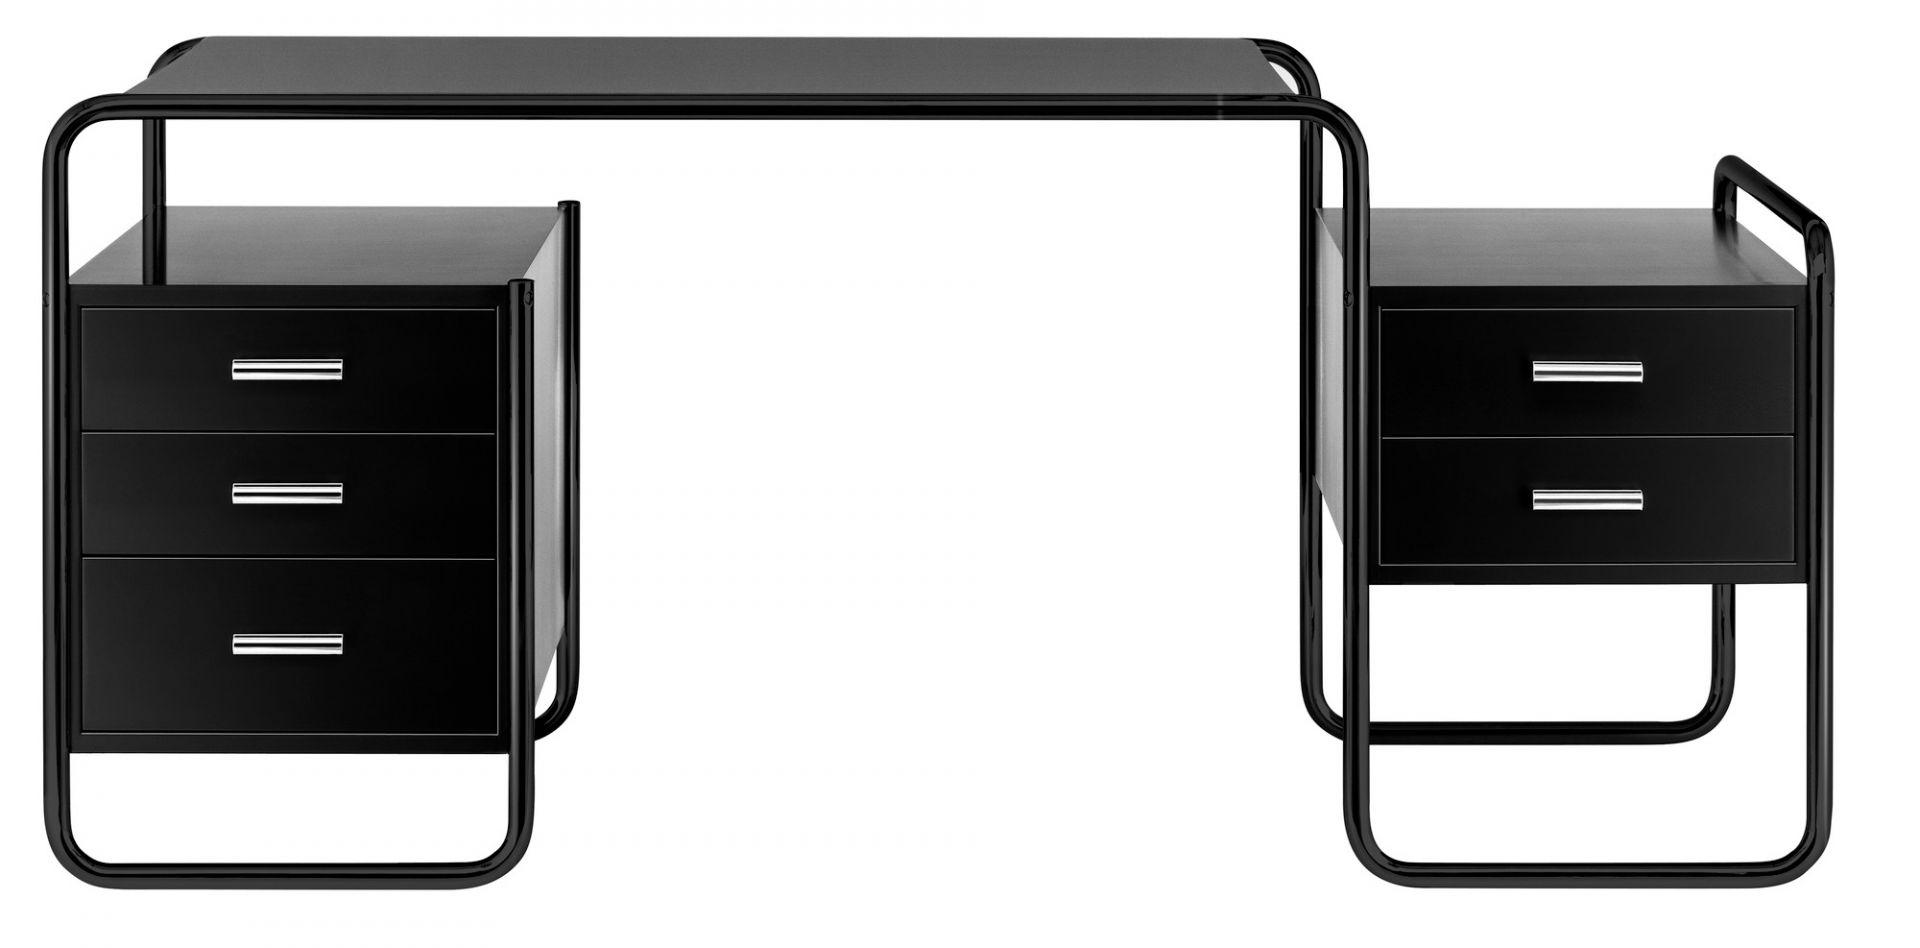 S 285 Tubular steel DeskThonet